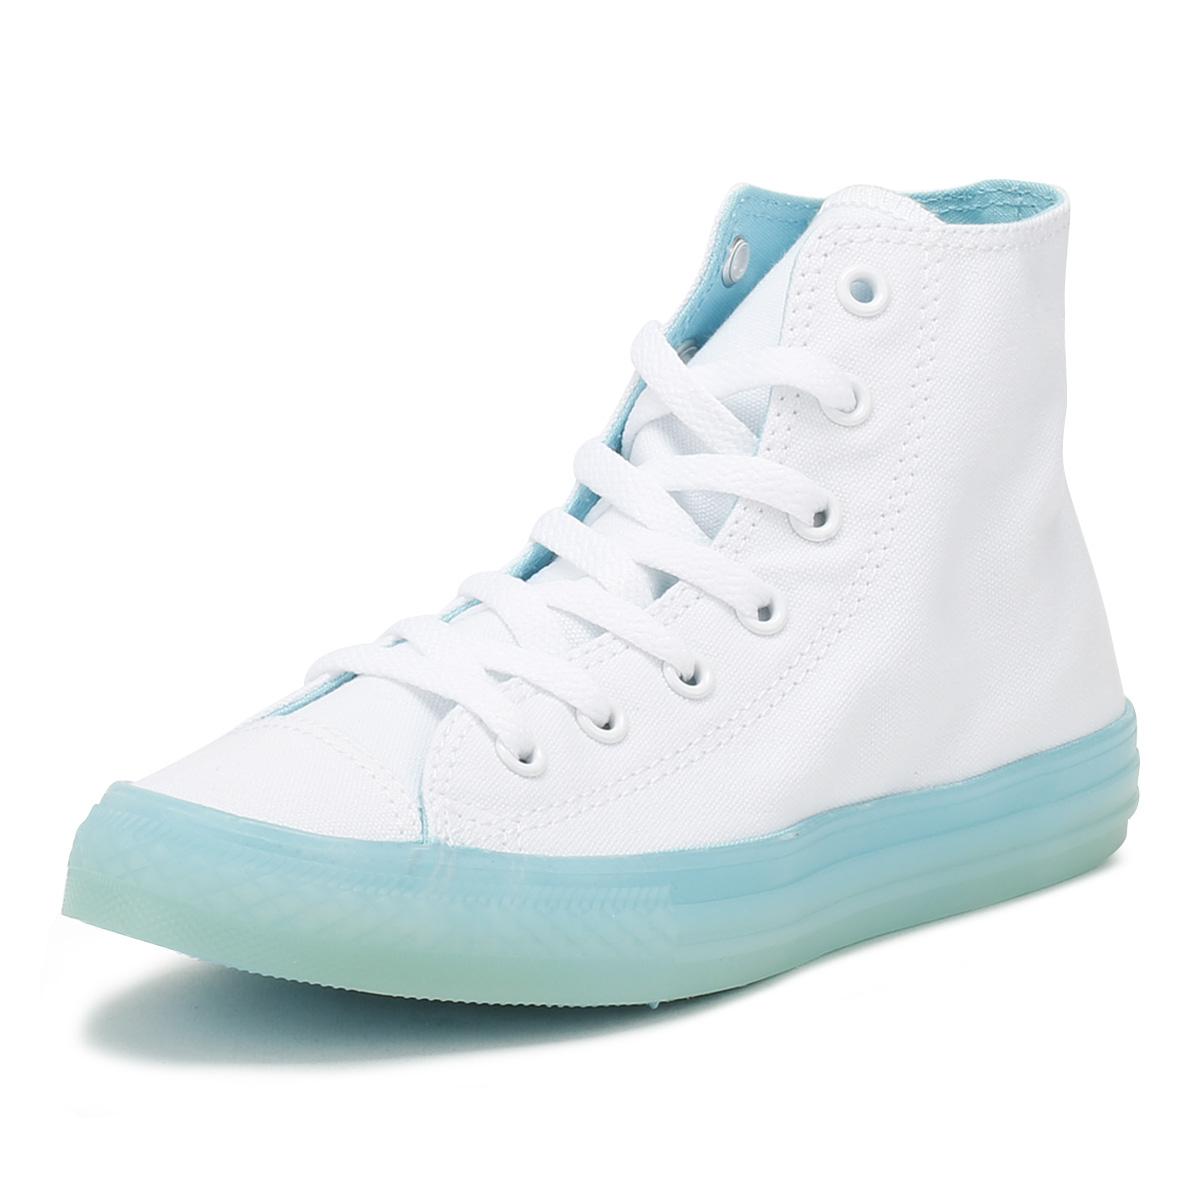 741e17af Details about Converse All Star Junior White & Aqua Hi Trainers Kids Lace  Up Ankle Shoes